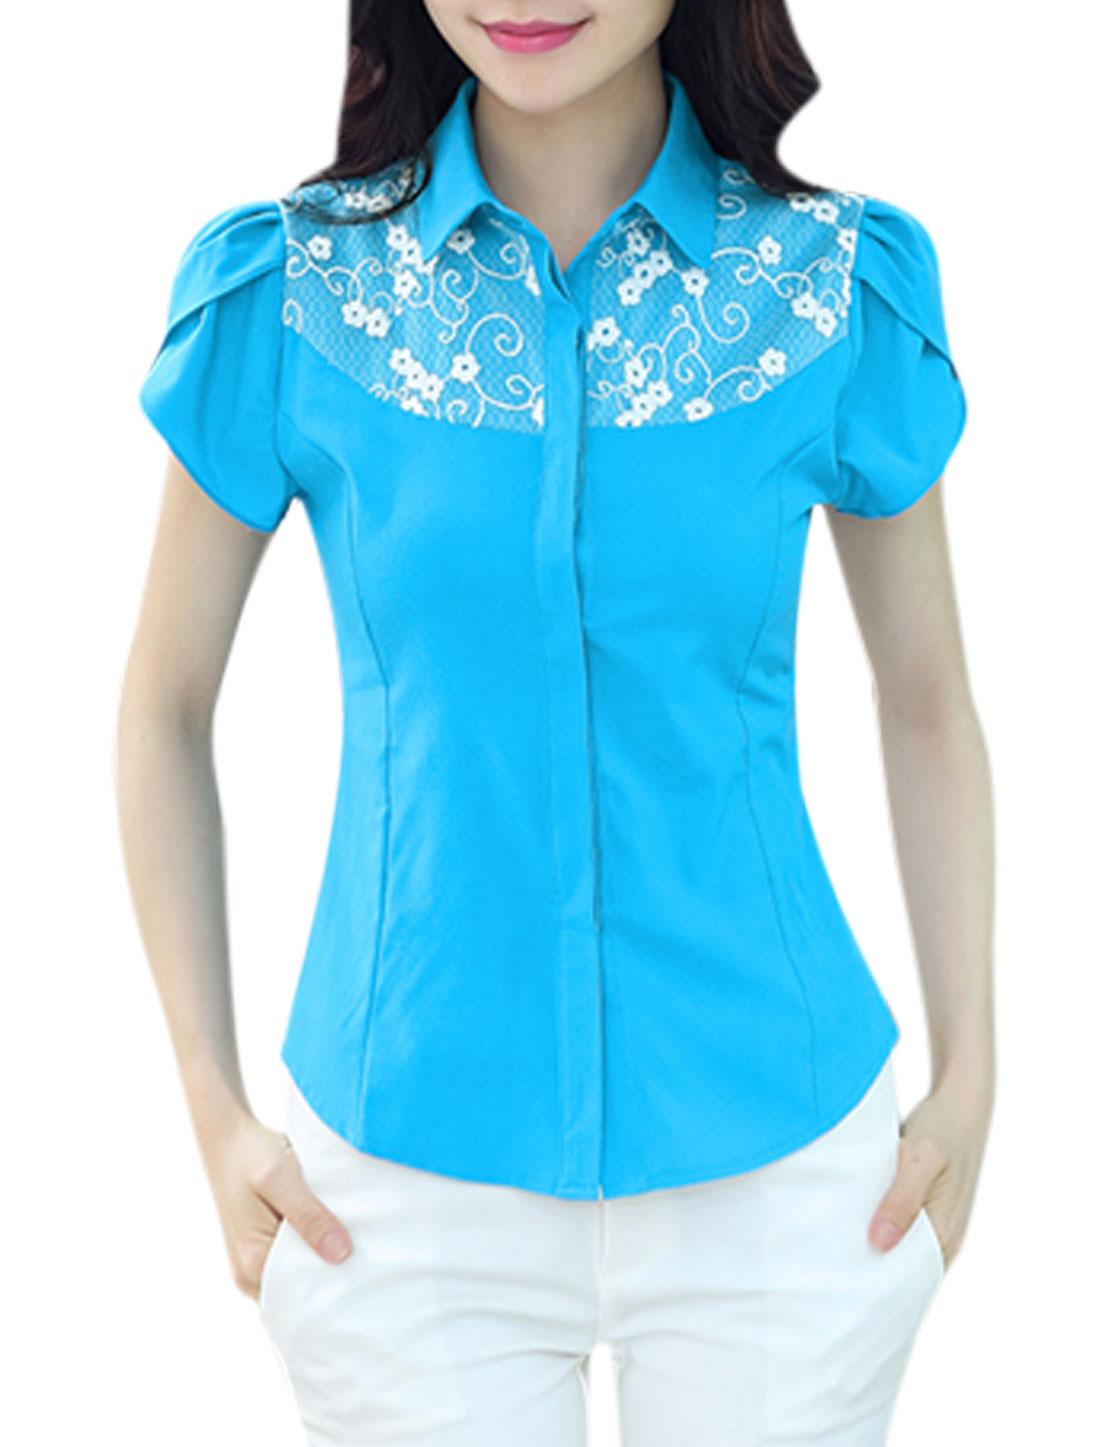 Woman Floral Design Organza Panel Button Down Shirt w Bow Tie Blue M